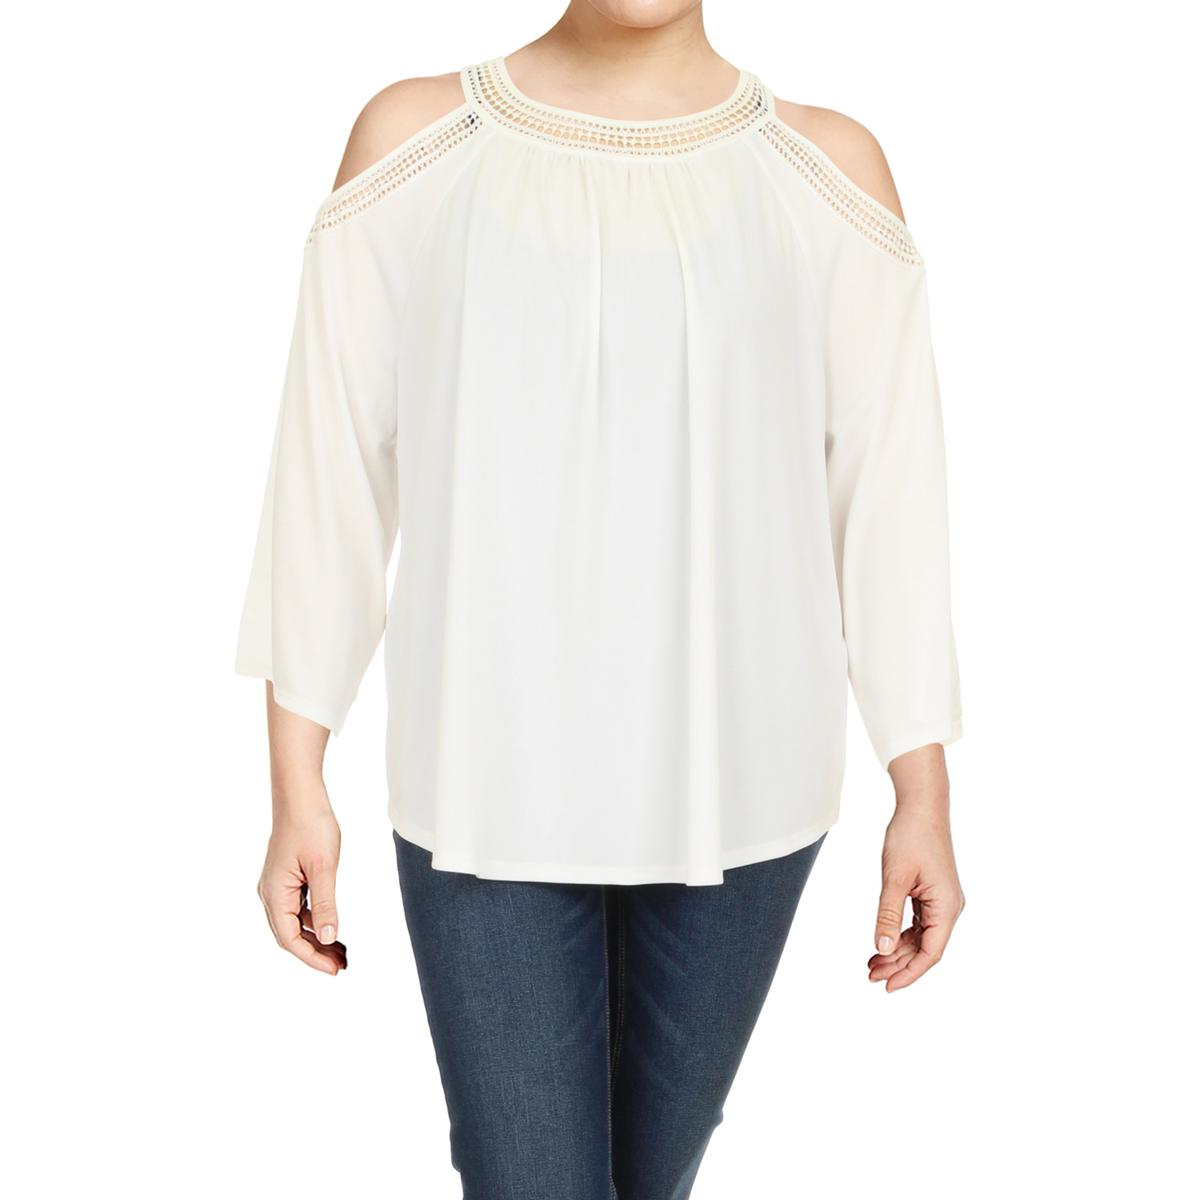 4dab01685f5 Details about Tommy Hilfiger Womens White Cold Shoulder Dress Top Blouse  Plus 1X BHFO 9815